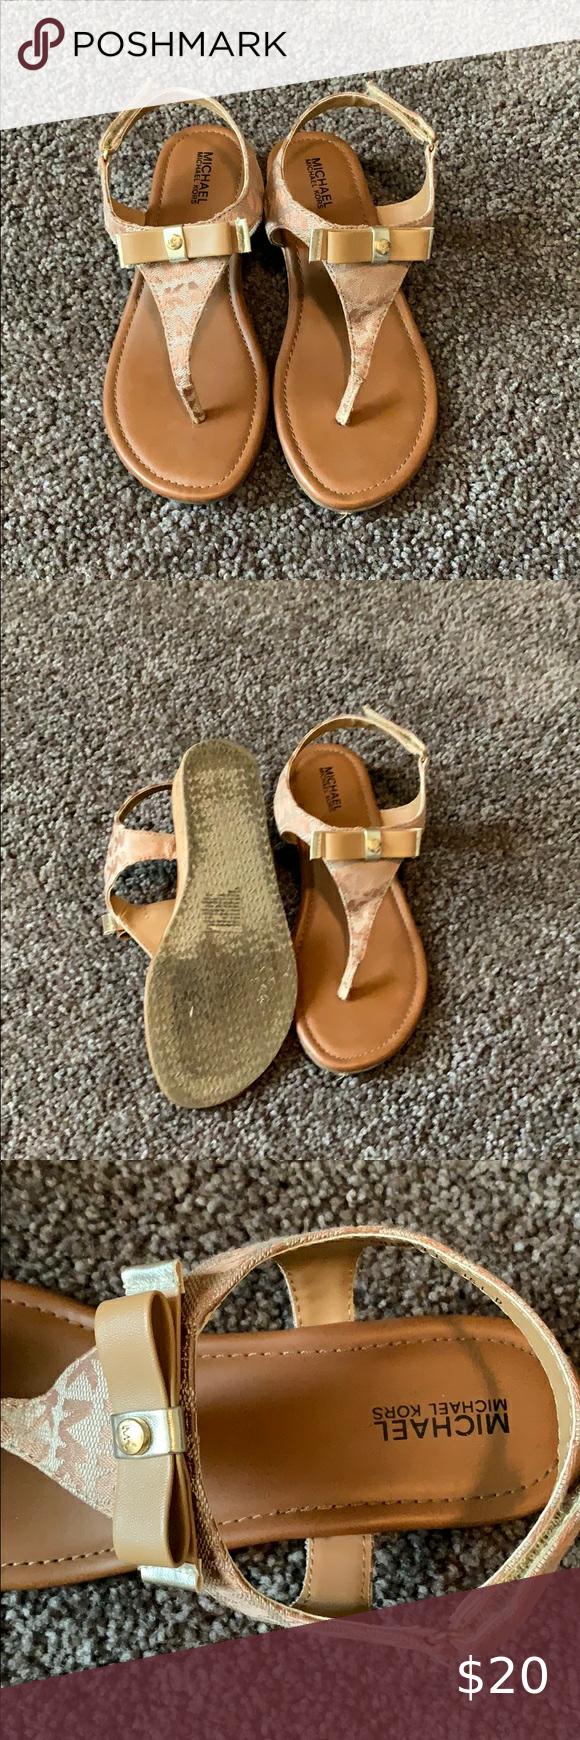 Strap sandals Michael Kors in 2020